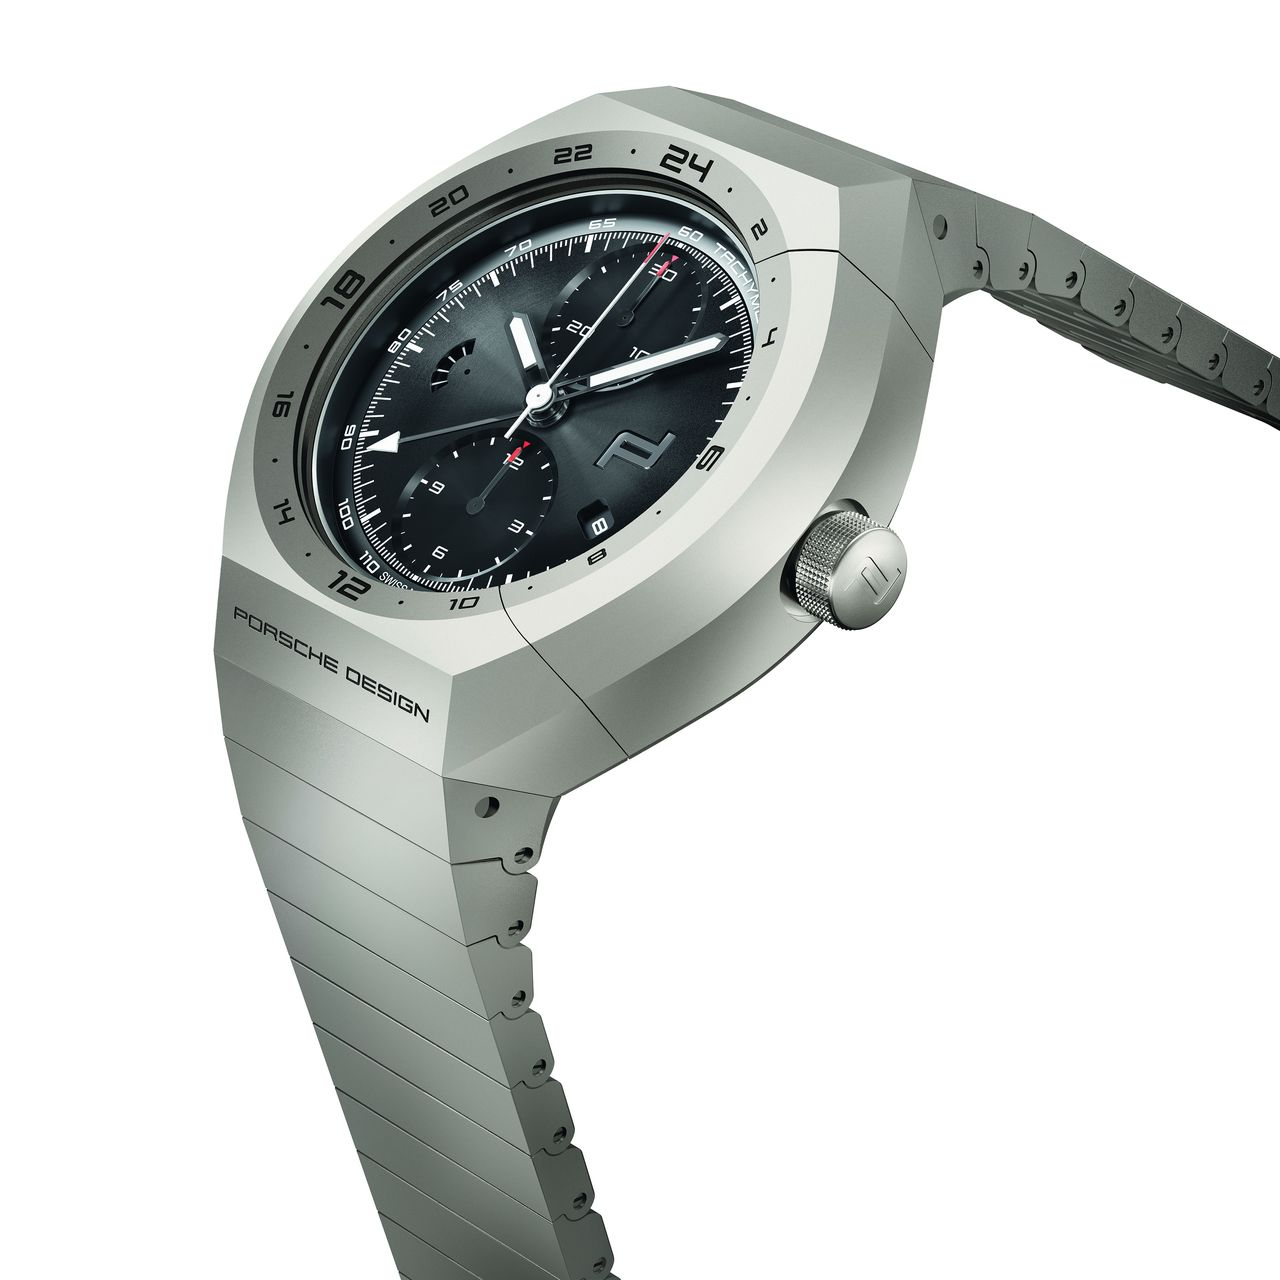 Porsche-Design-Monobloc-Actuator-GMT-Chronograph-titanium-angle